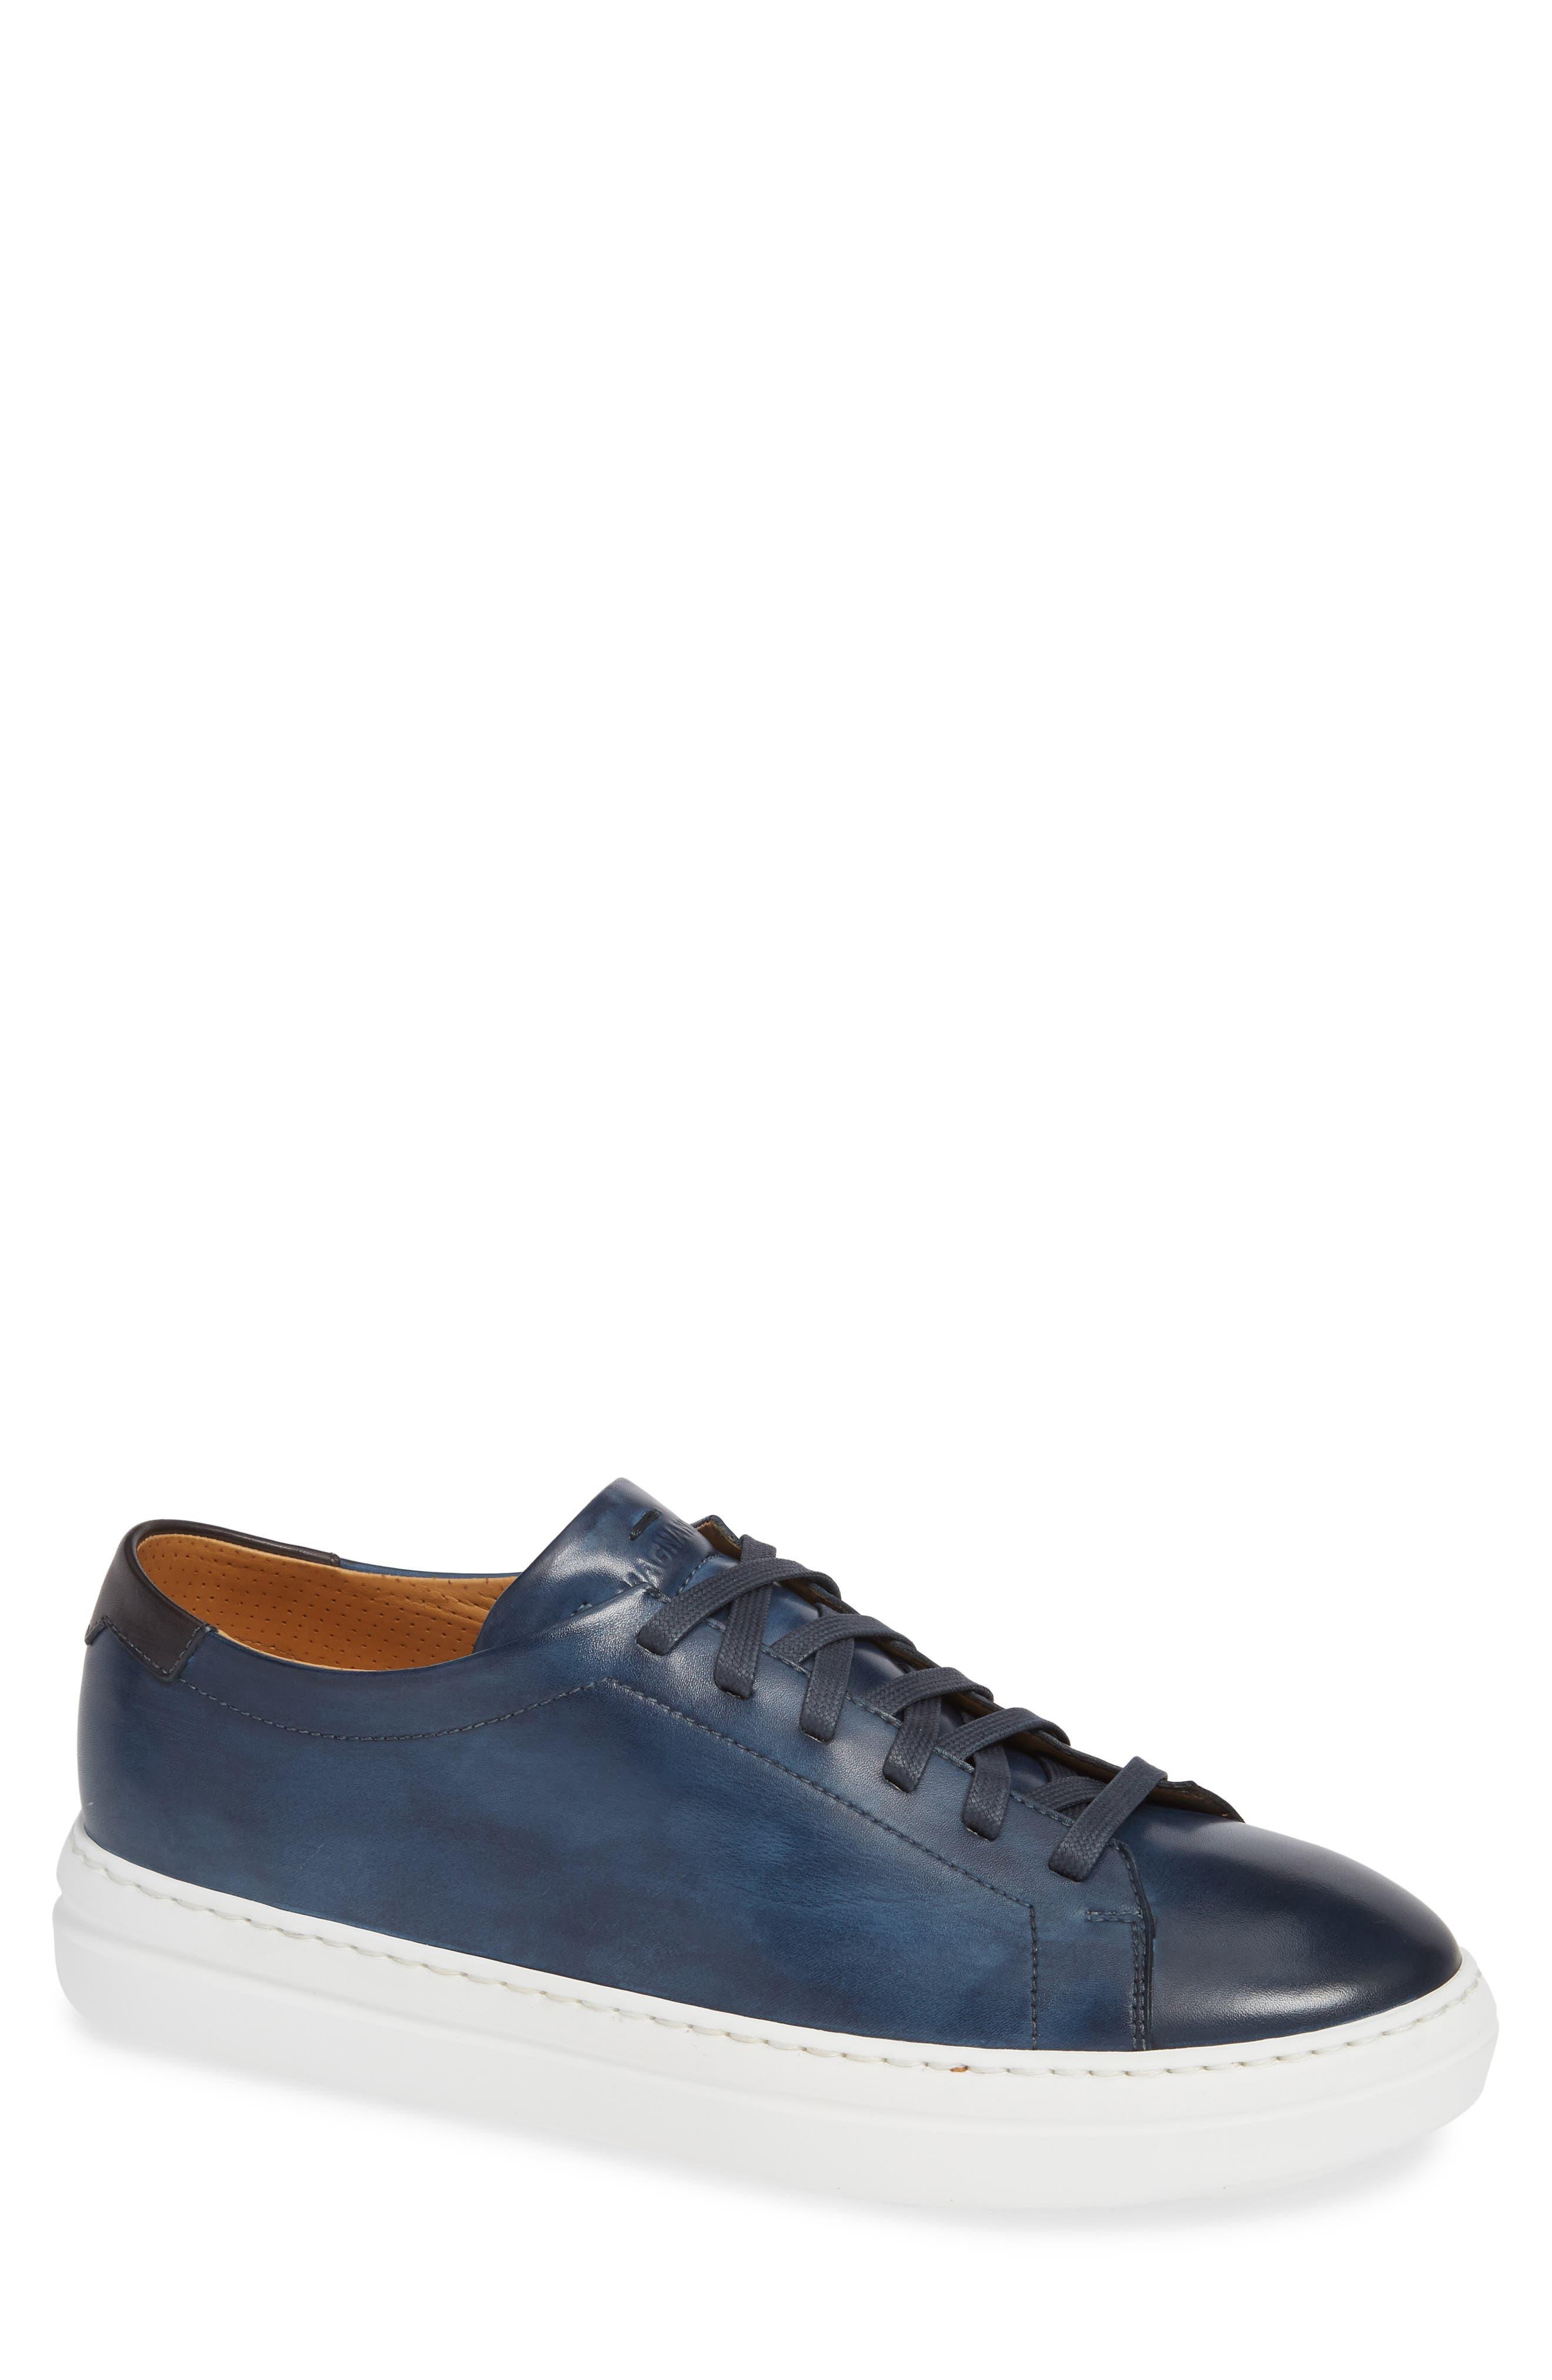 MAGNANNI, Bartolo Sneaker, Main thumbnail 1, color, NAVY LEATHER